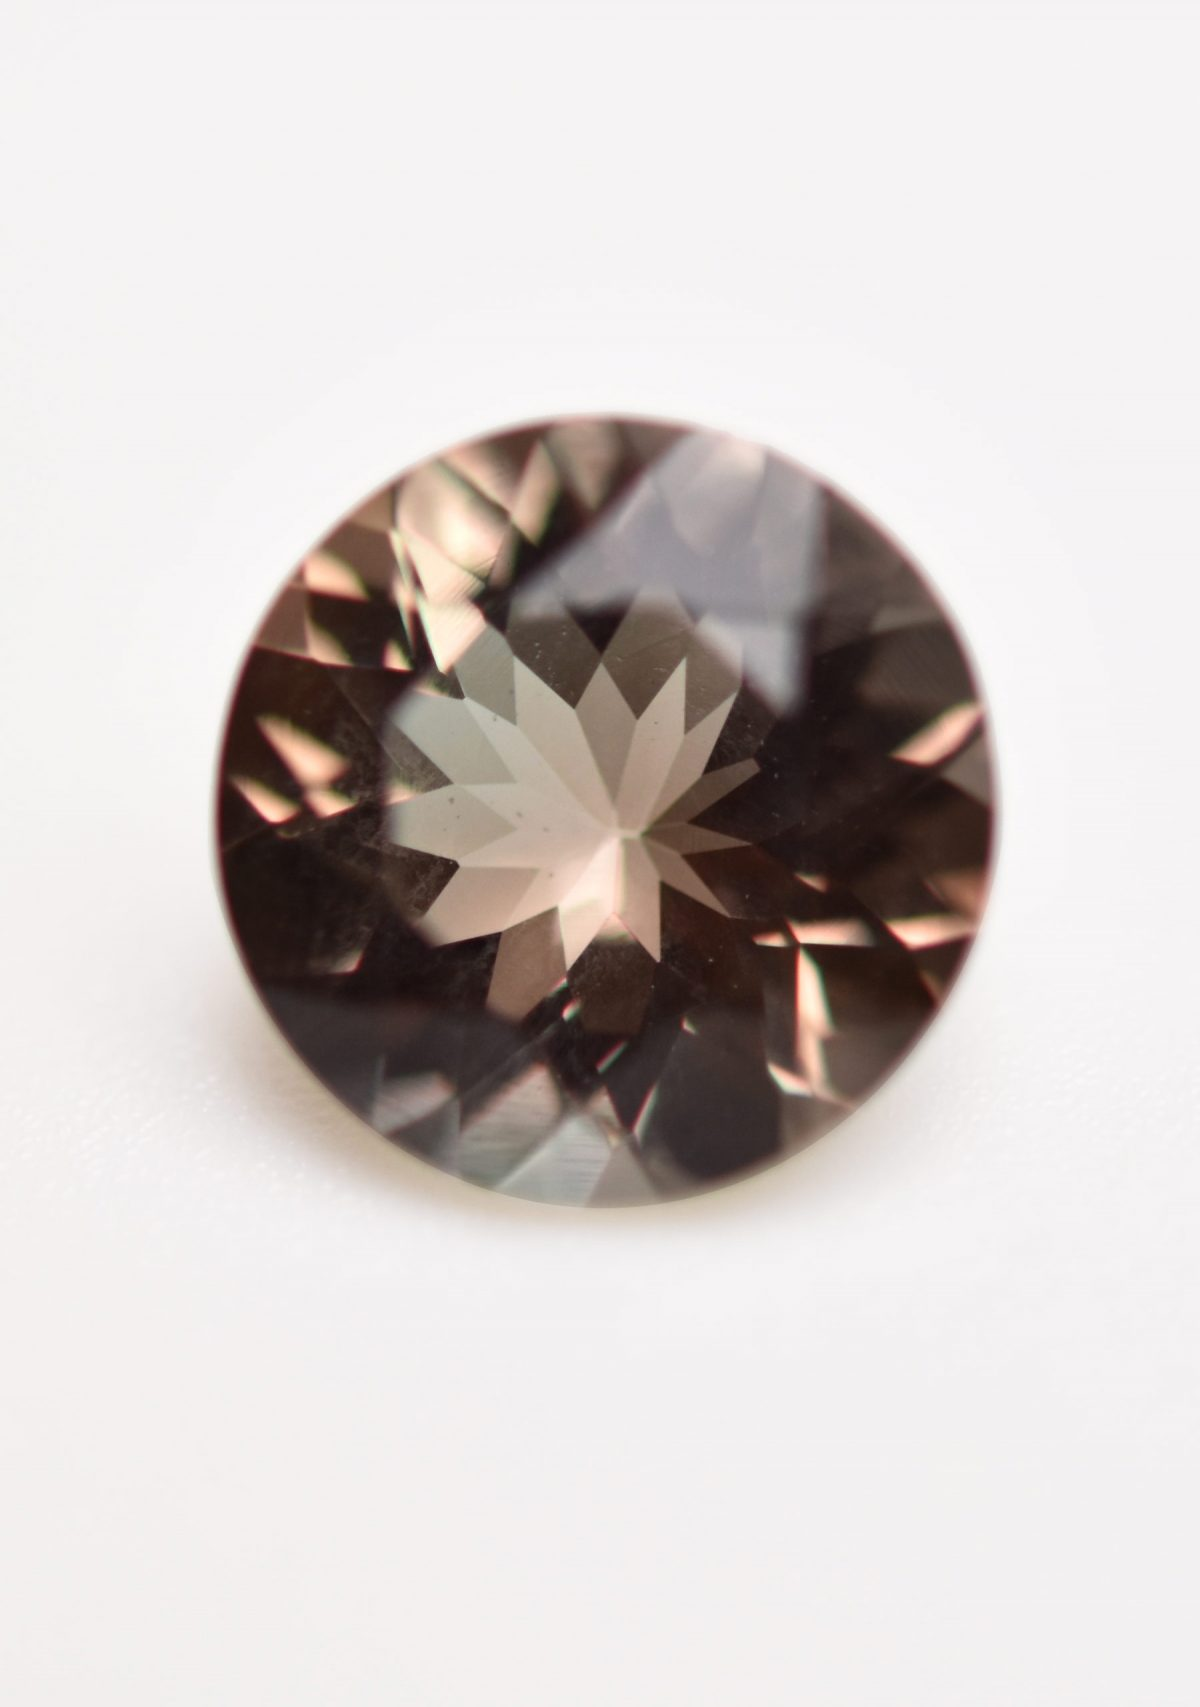 Round Sunset Color Sunstone Gemstone for Custom Ring